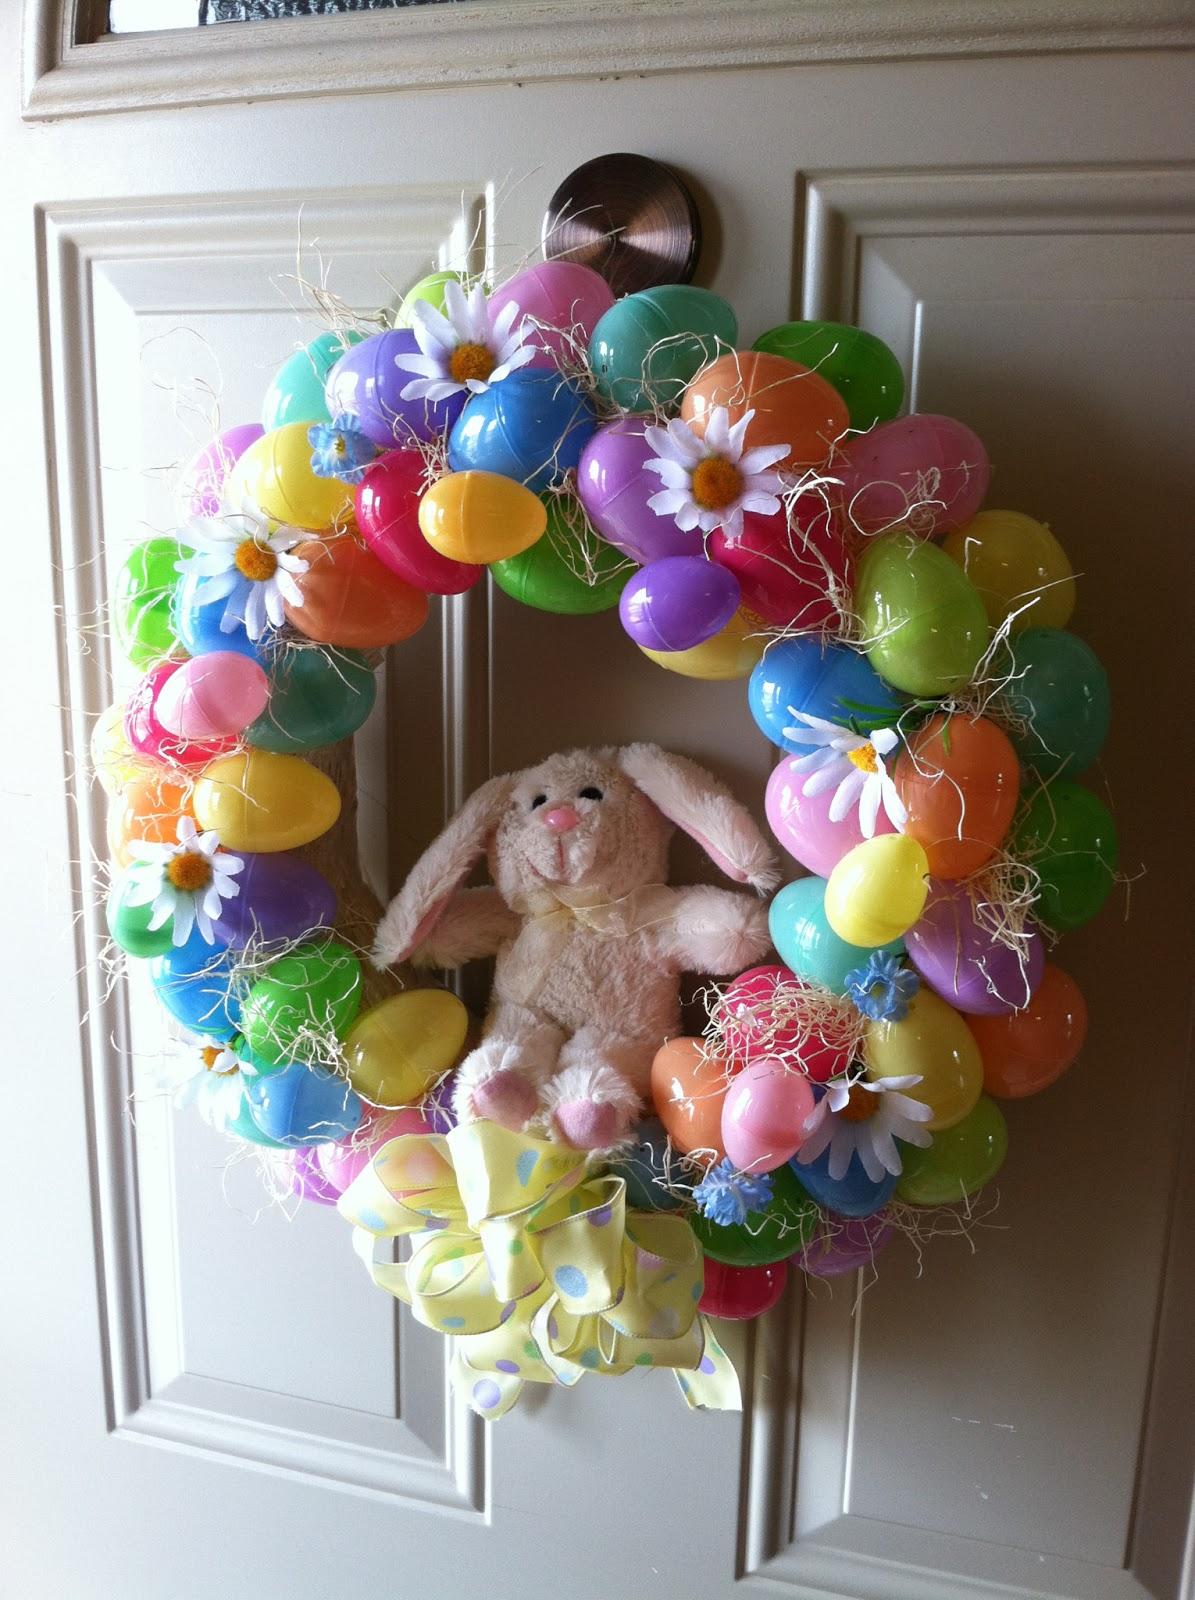 Natural Homemade Living: DIY Easter Wreath